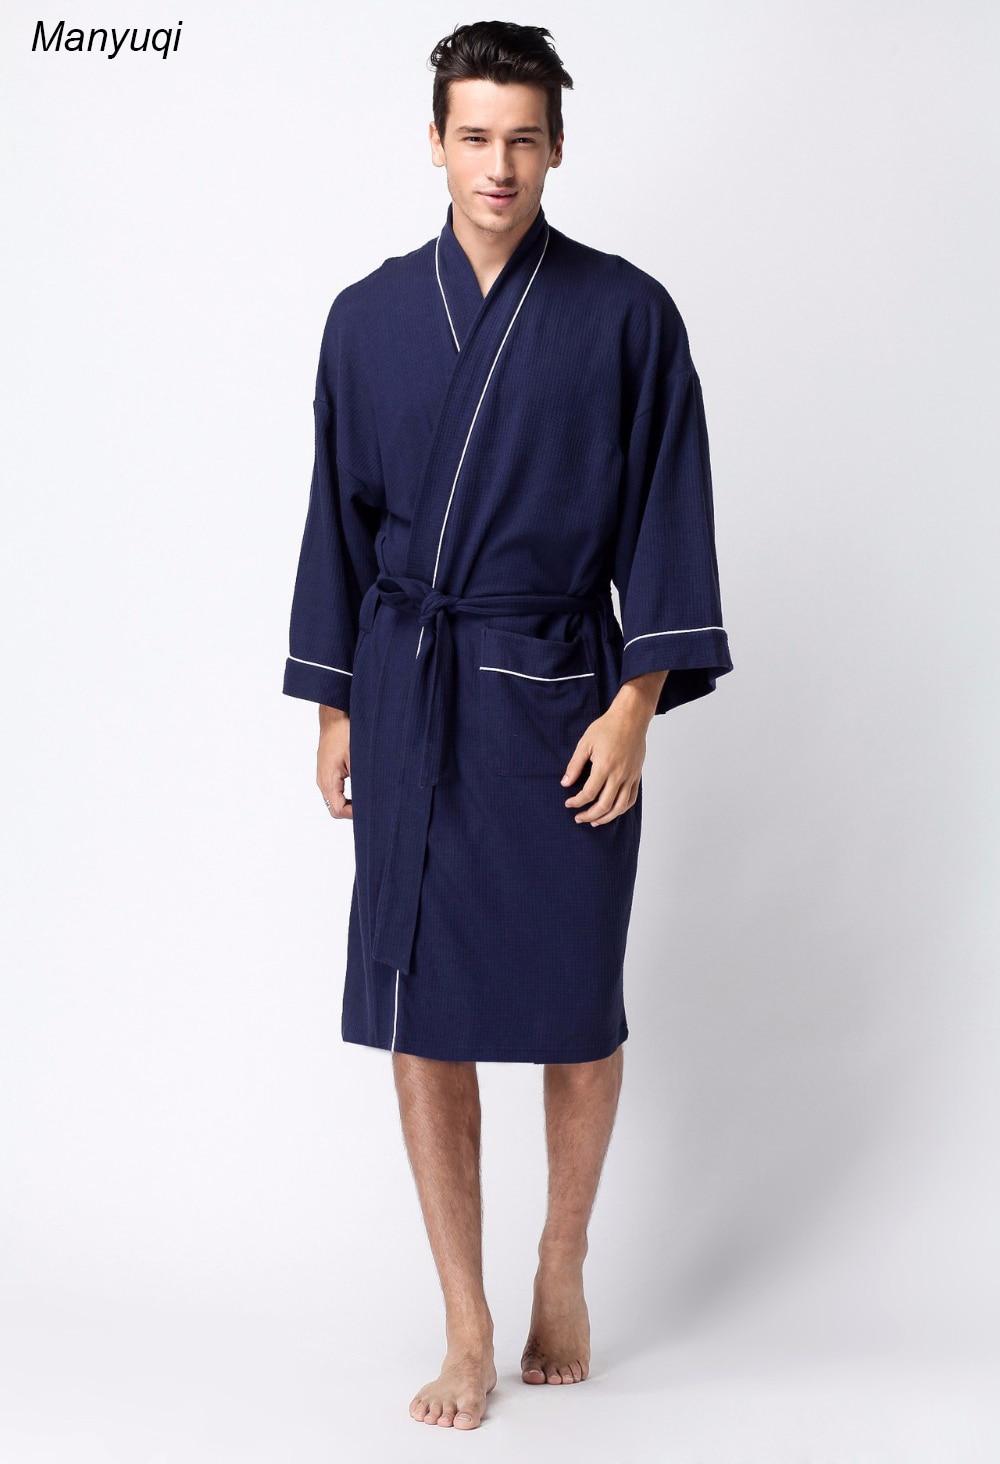 sale autumn shoes forefront of the times Women's and Man's bathrobe Cotton Waffle kimono style ...